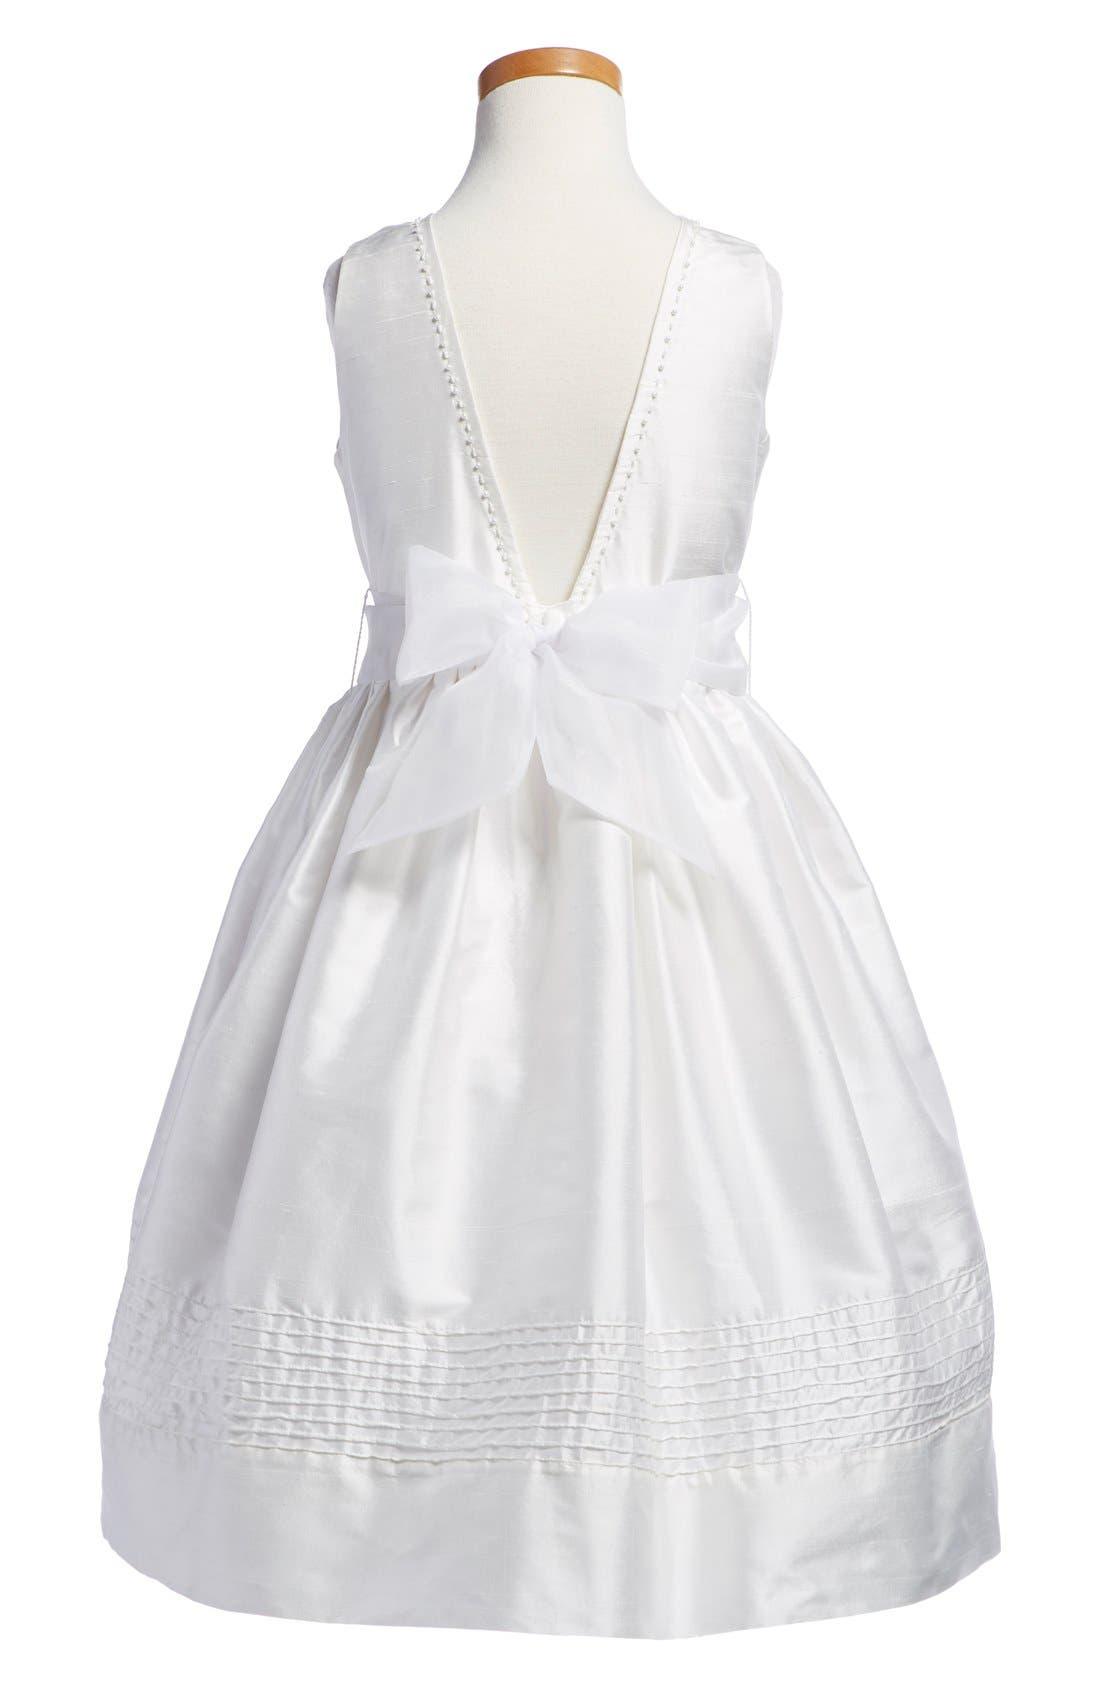 'Melody' Sleeveless Dress,                             Alternate thumbnail 4, color,                             105